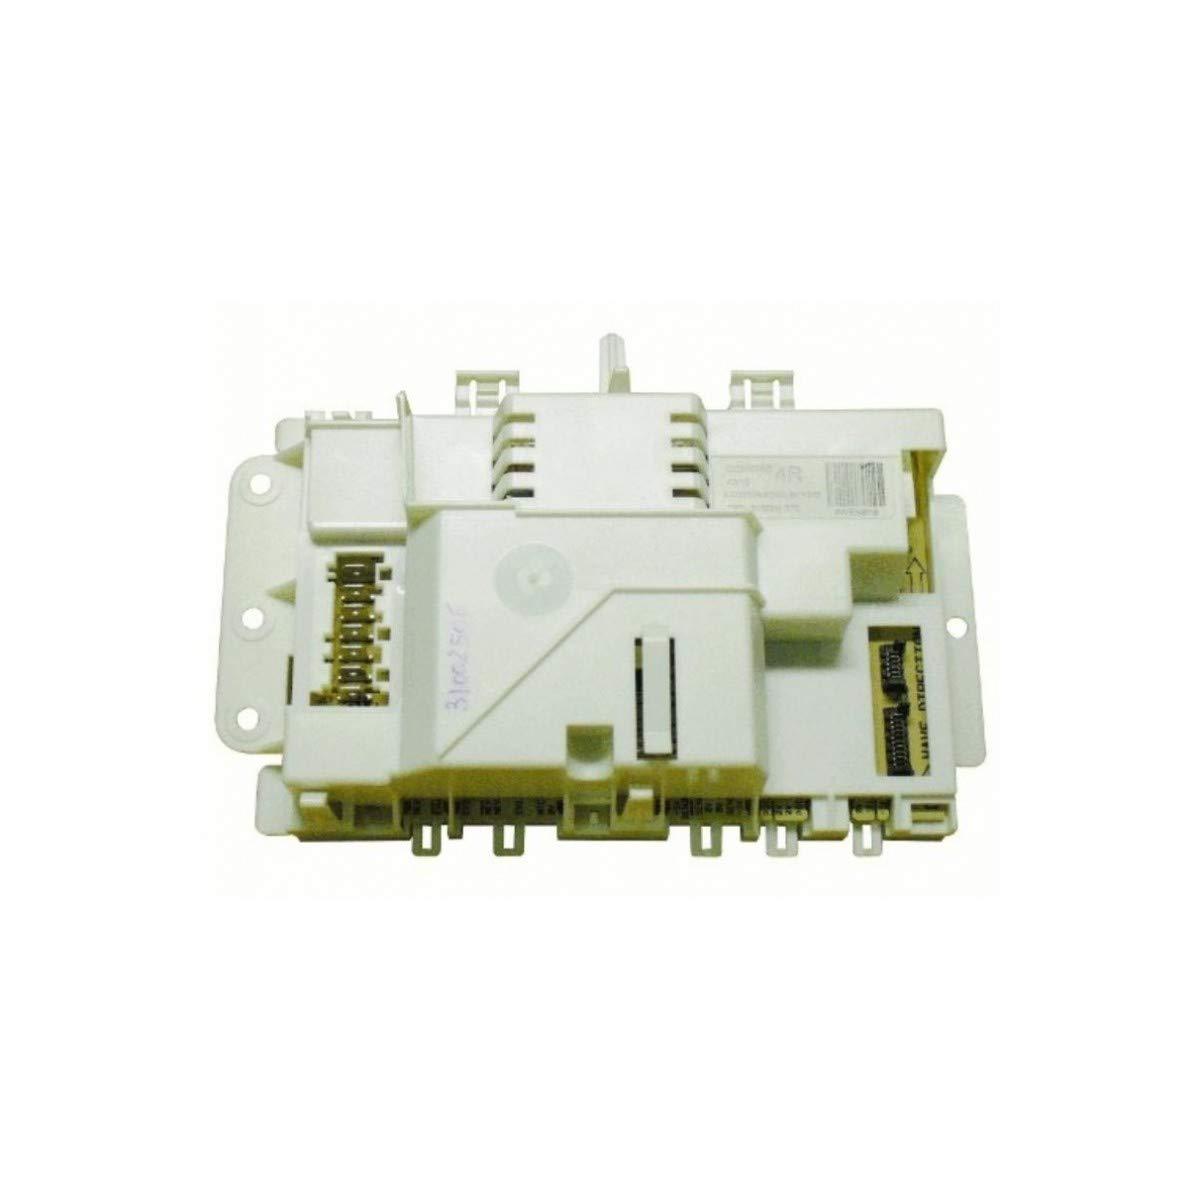 Modulo electronico Lavadora Candy GO108-16S 49015451: Amazon.es